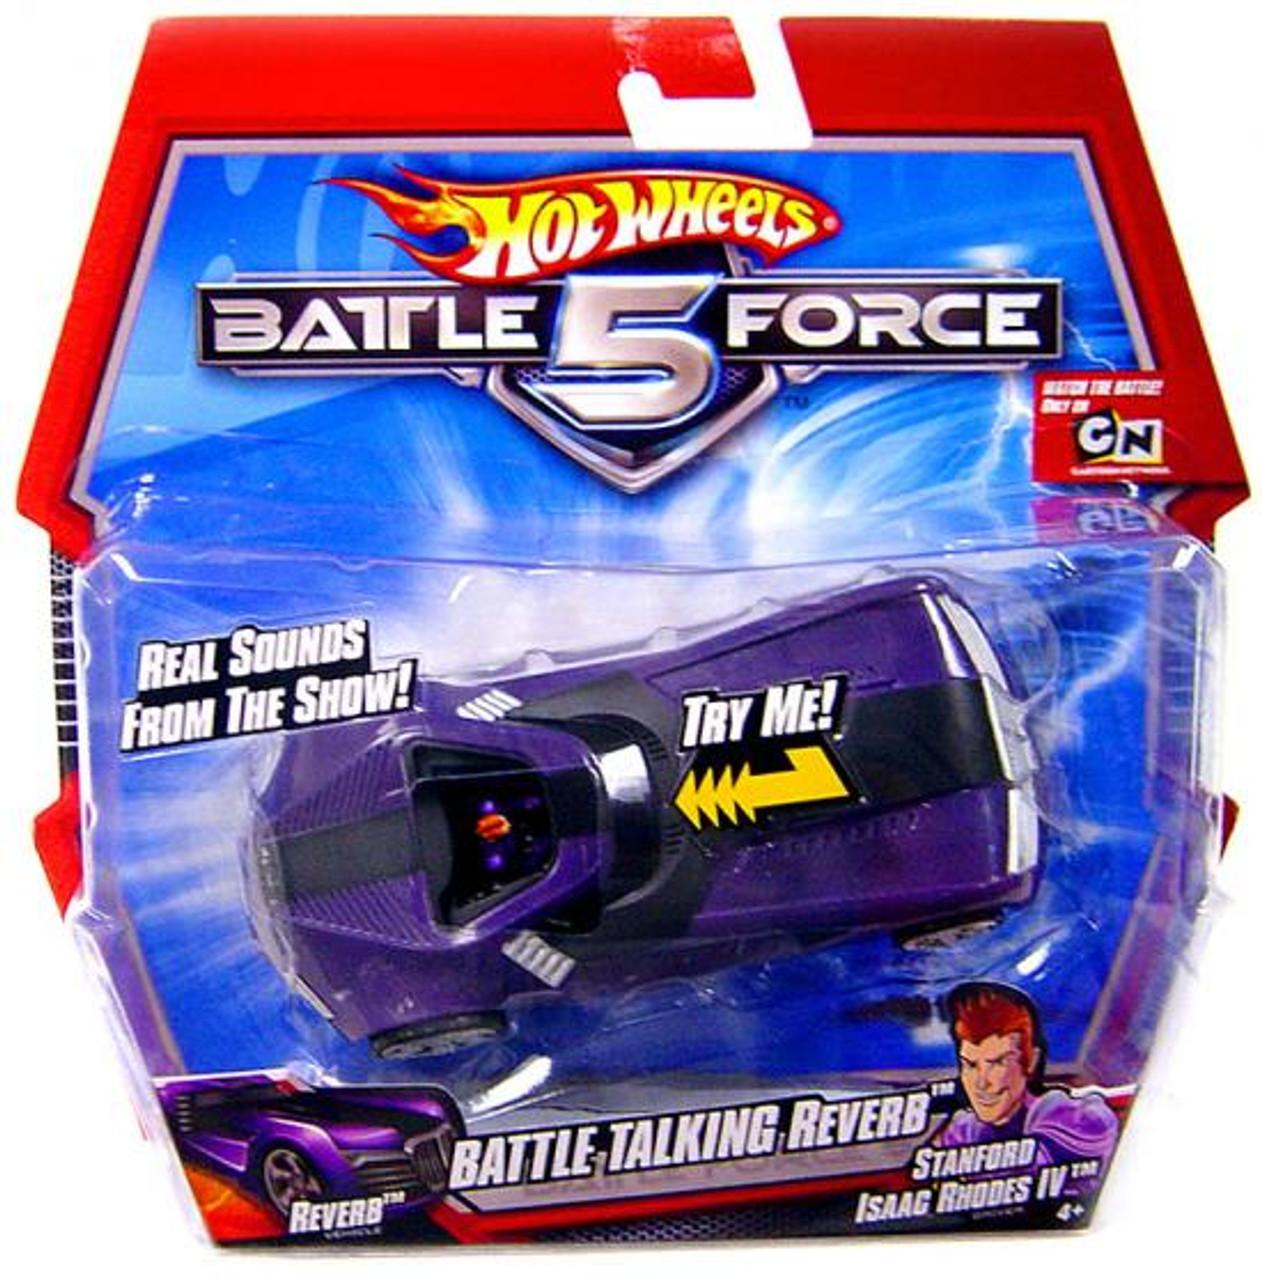 Hot Wheels Battle Force 5 Reverb Diecast Vehicle [Battle Talking]